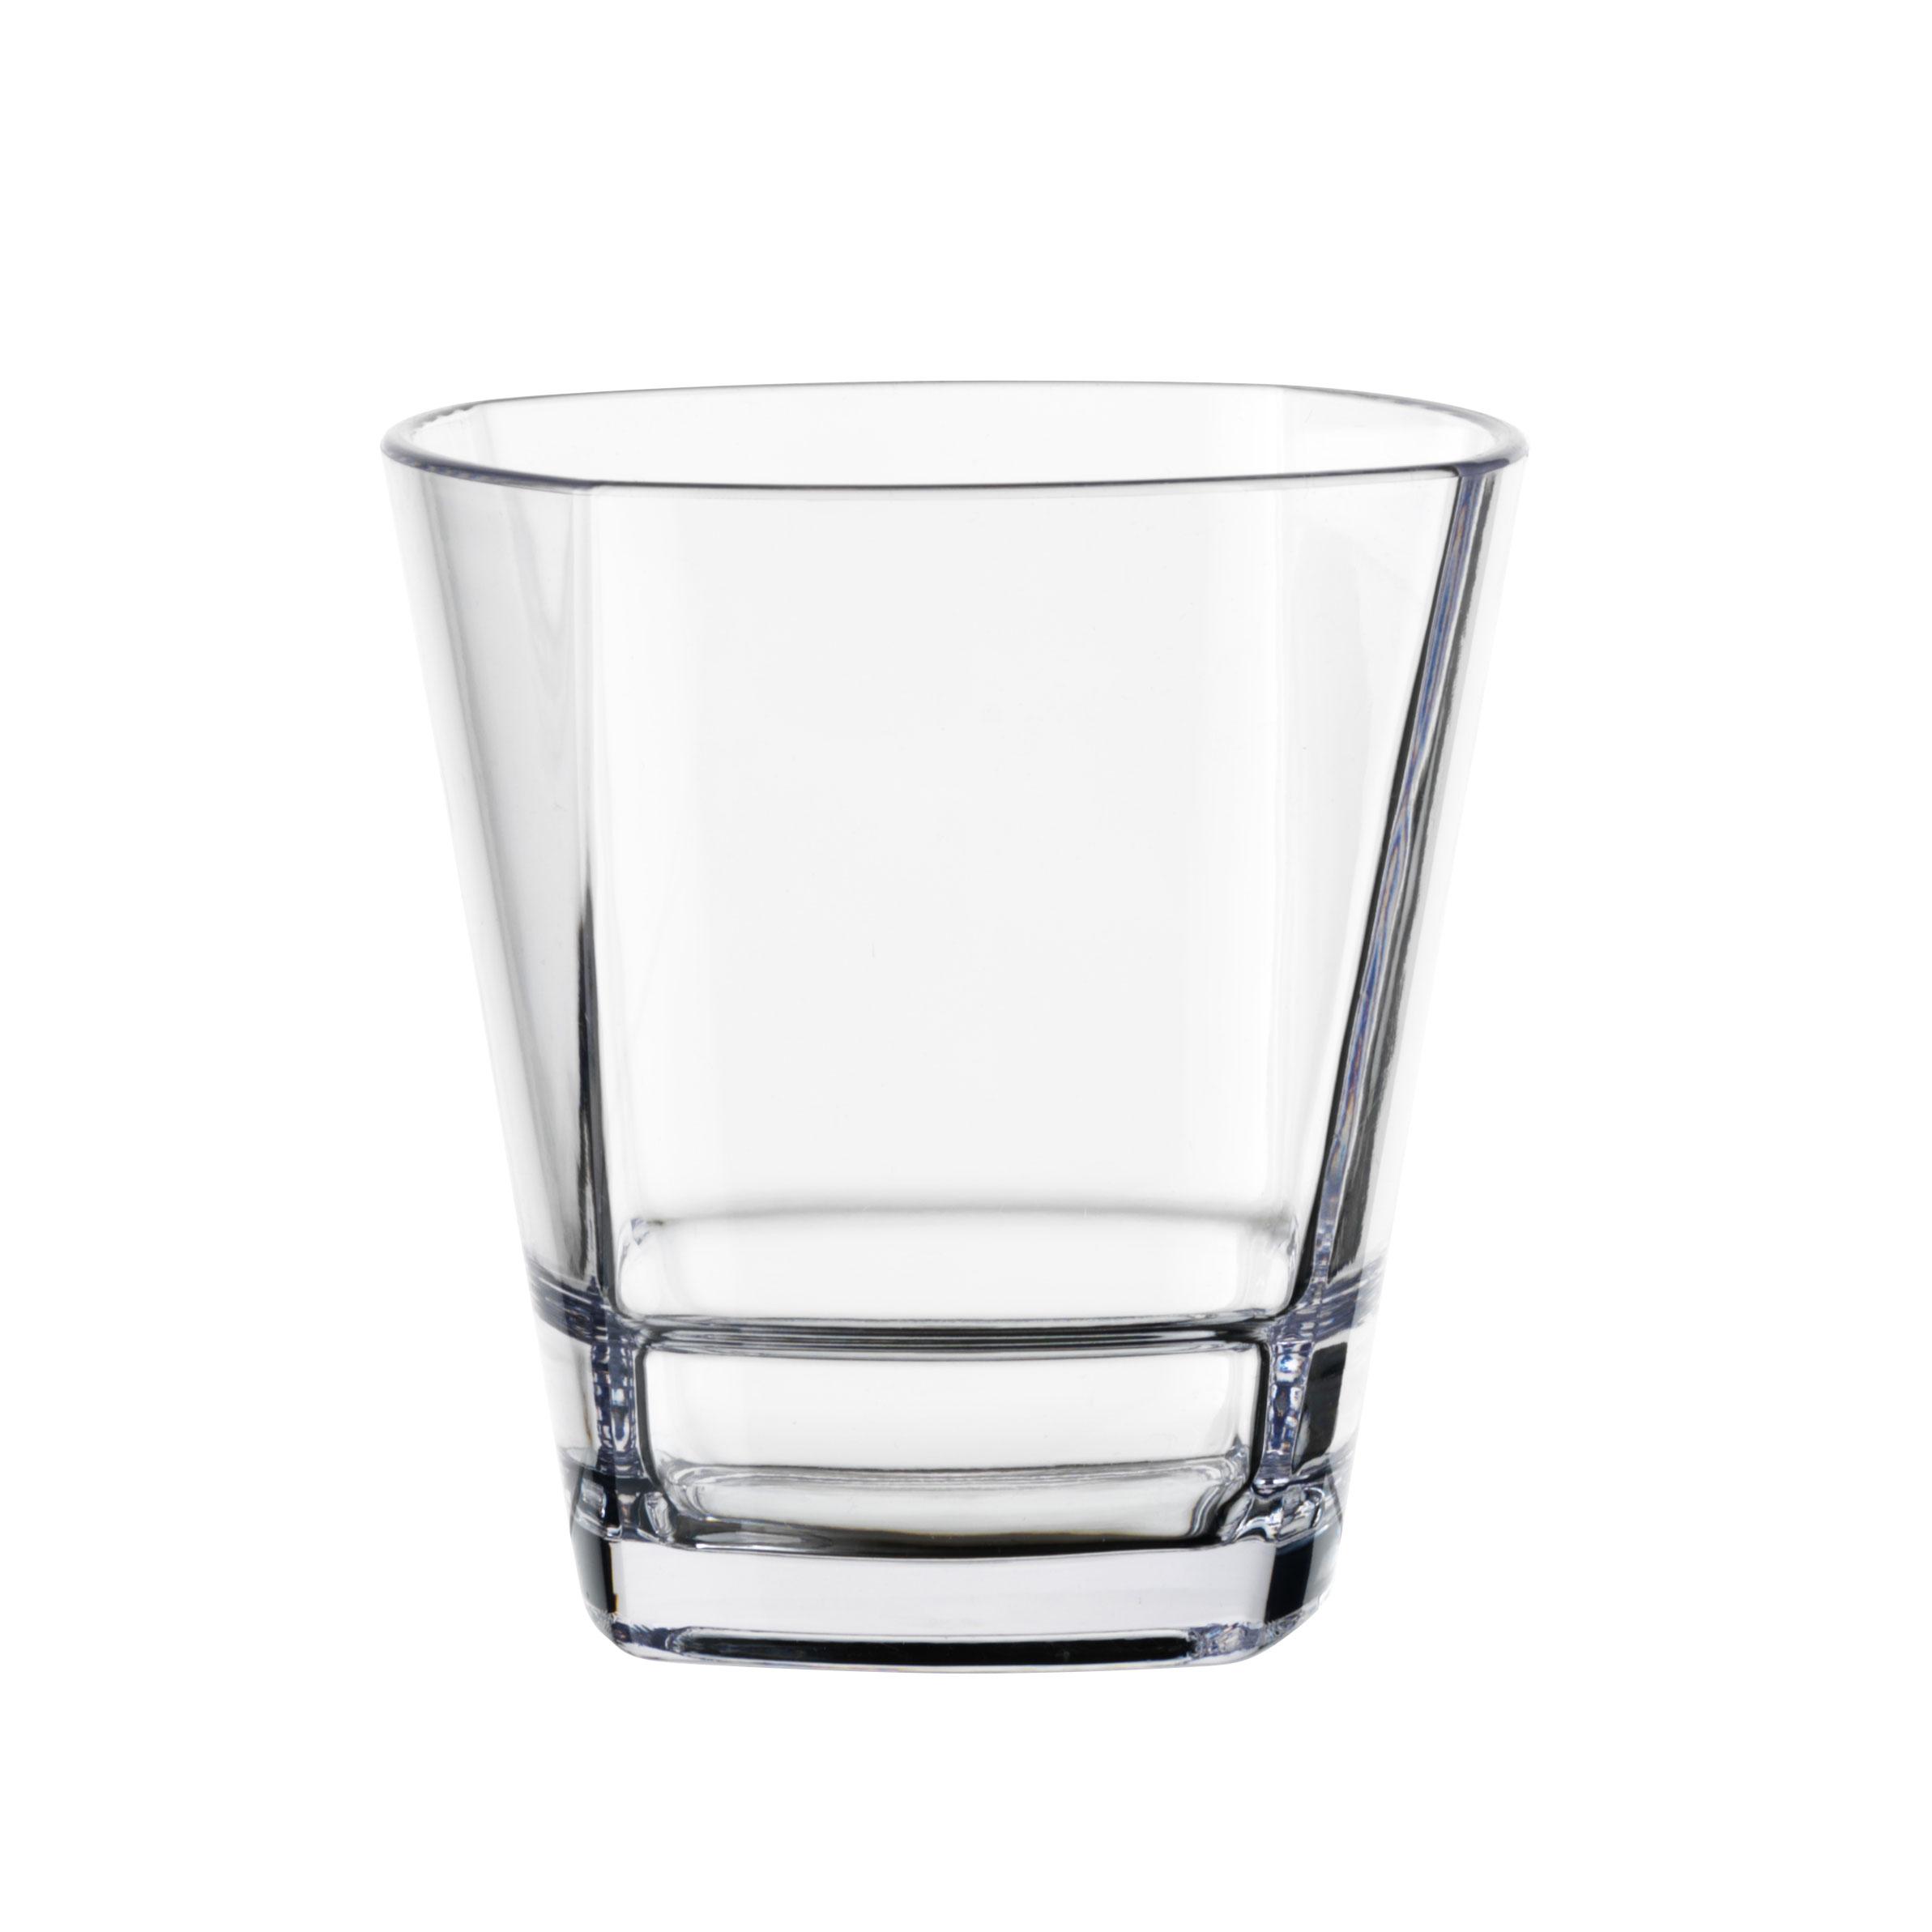 Libbey Glass 92441 glassware, plastic